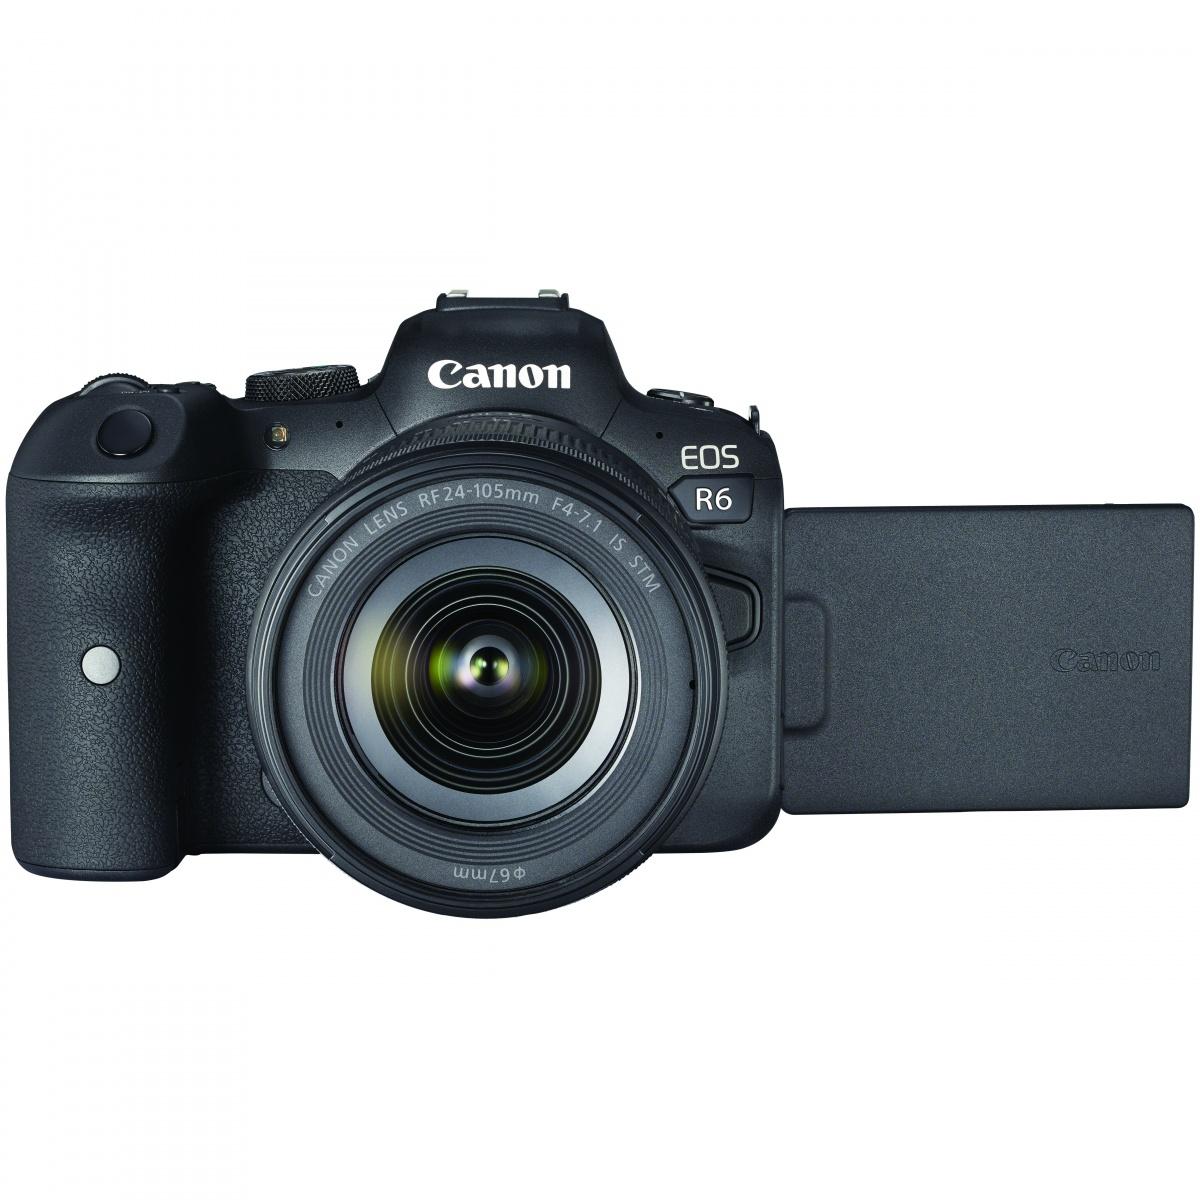 Canon EOS R6 Kit mit 24-105 mm 1:4,0-7,1